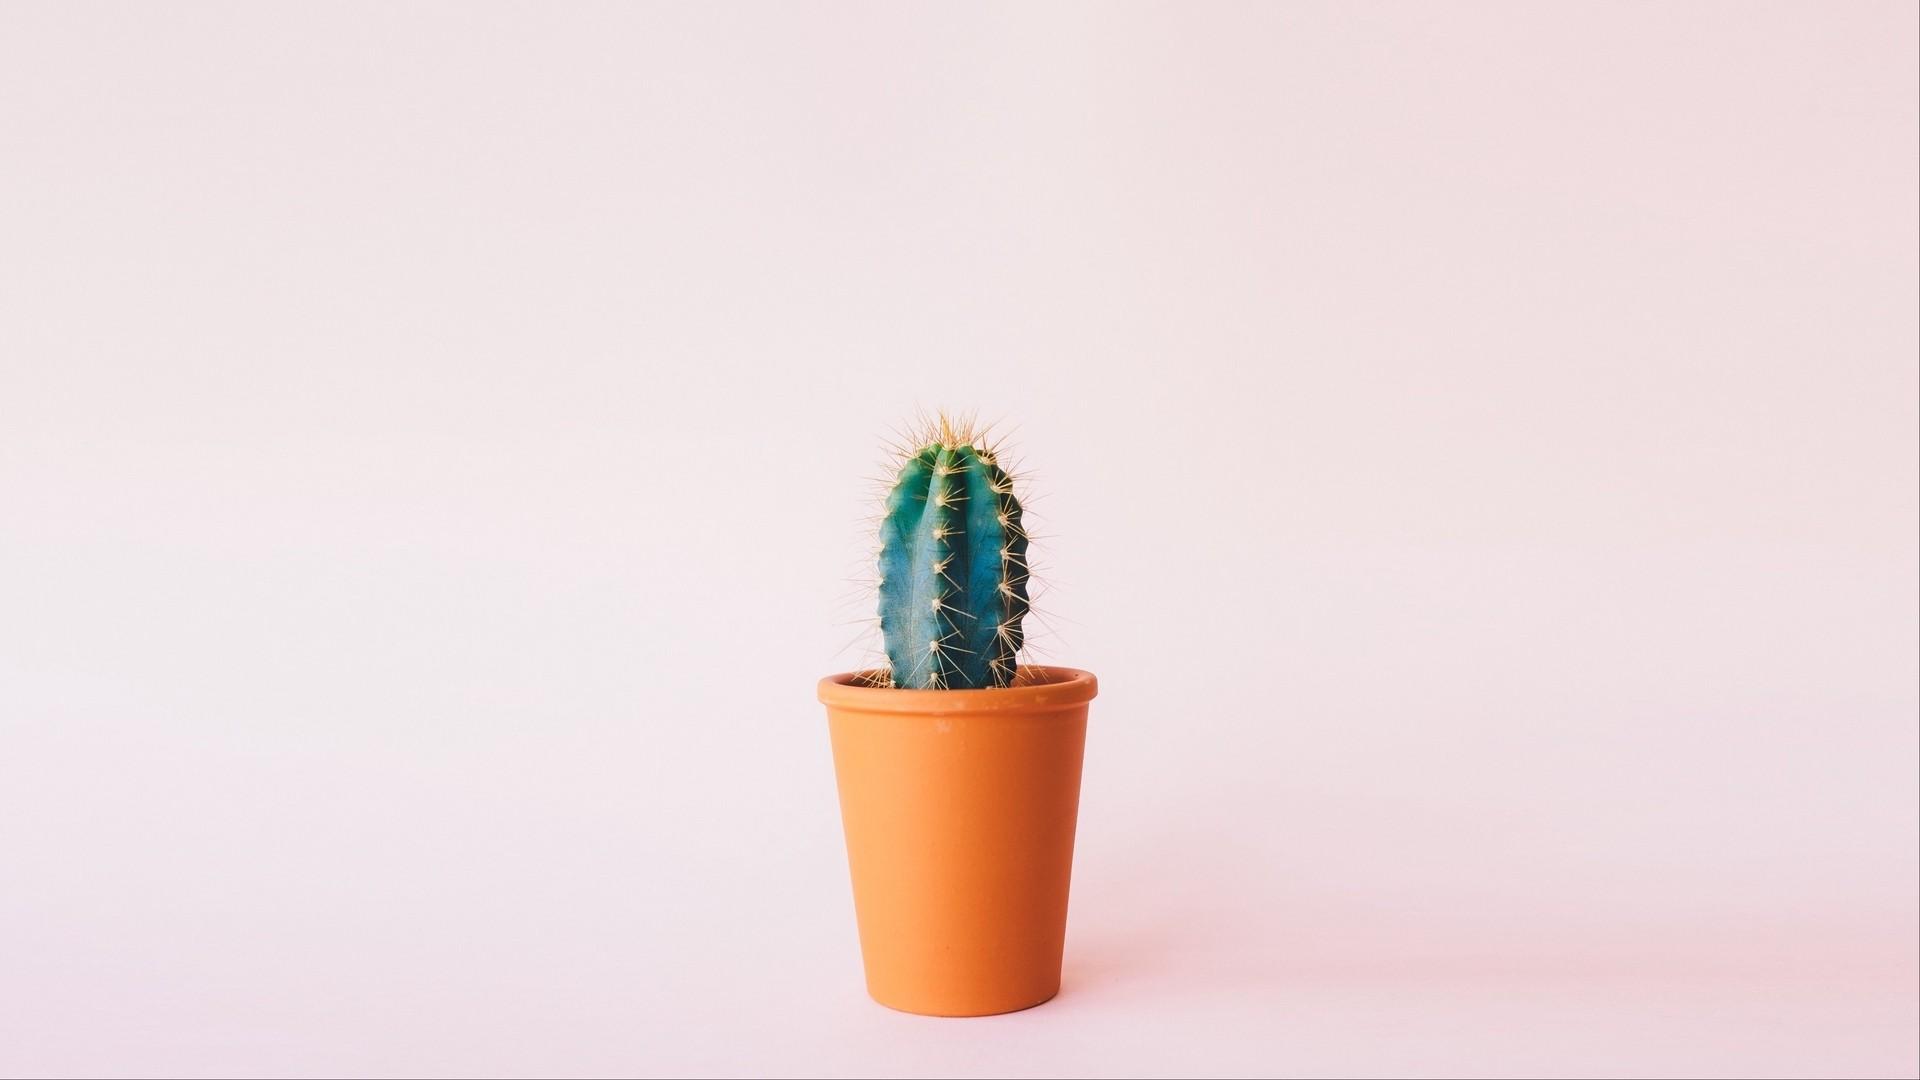 Cactus Minimalist computer wallpaper